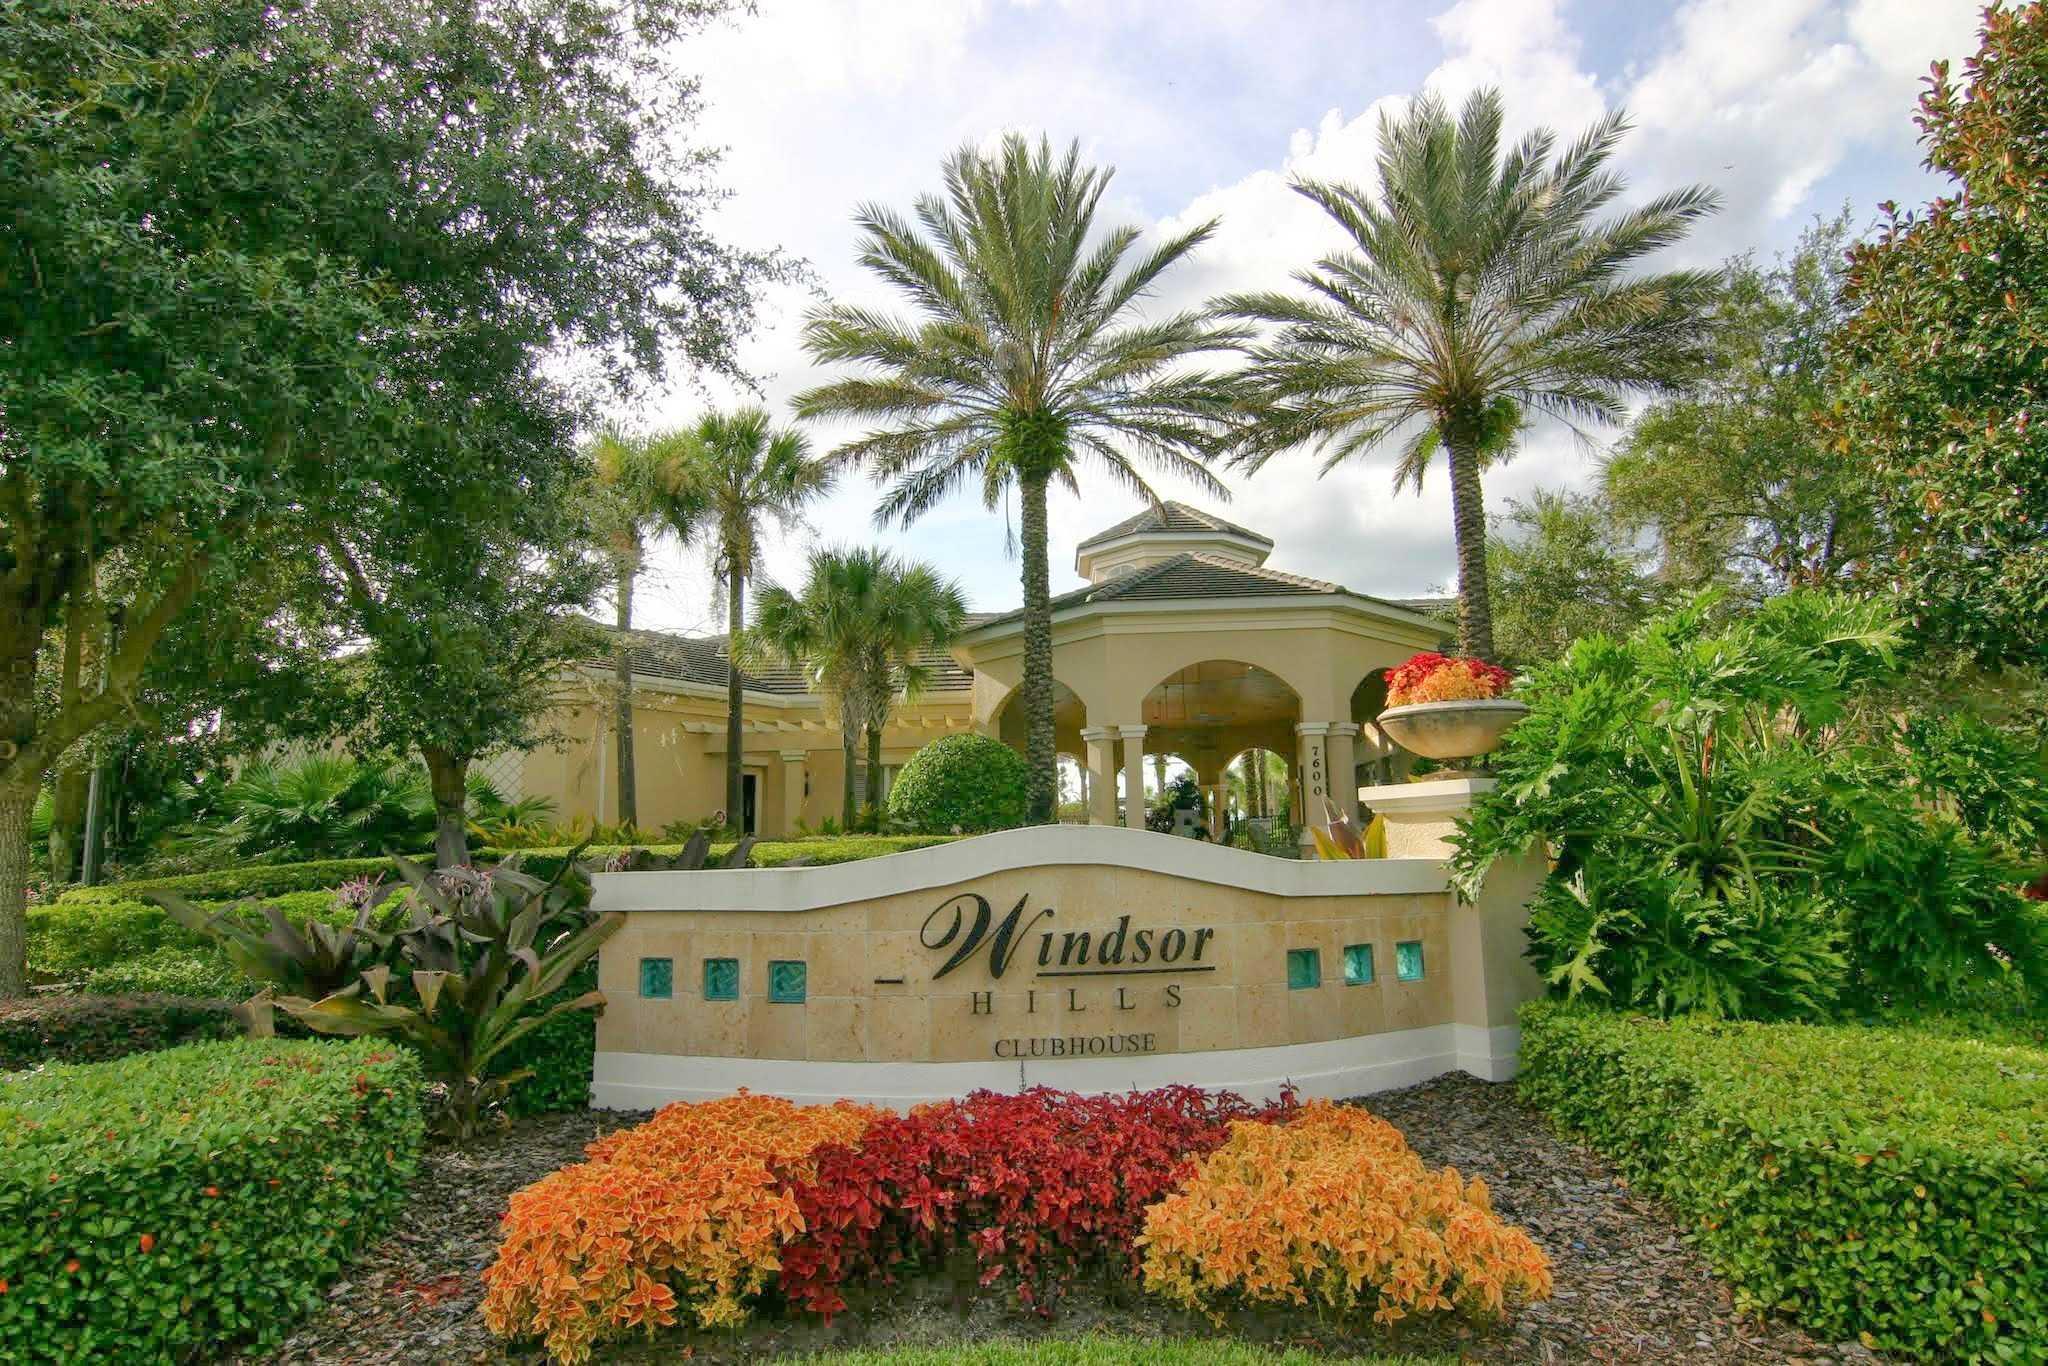 Windsor Hills Resort Welcomes You